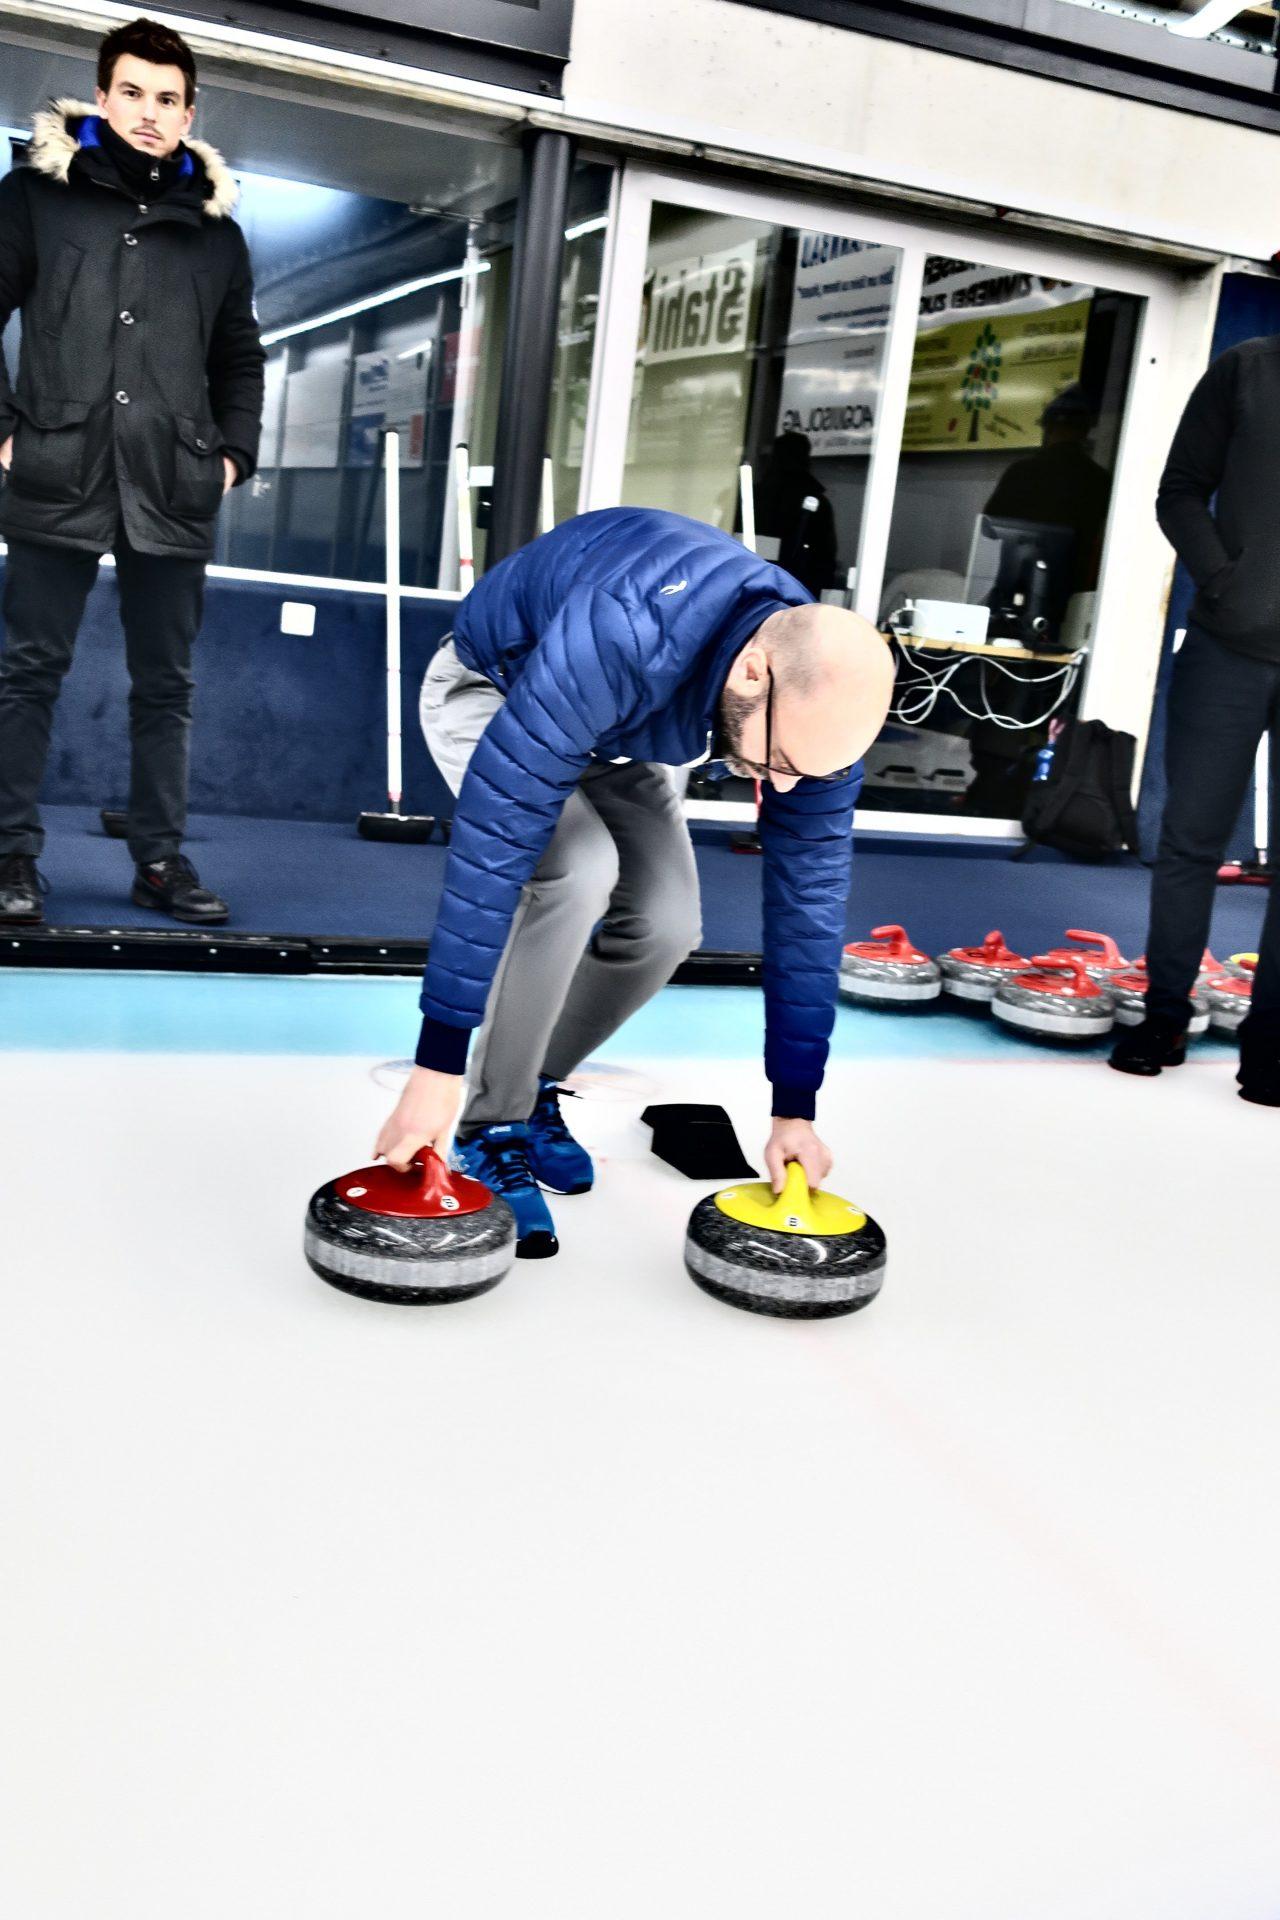 MSc International Financial Management: Curling Event